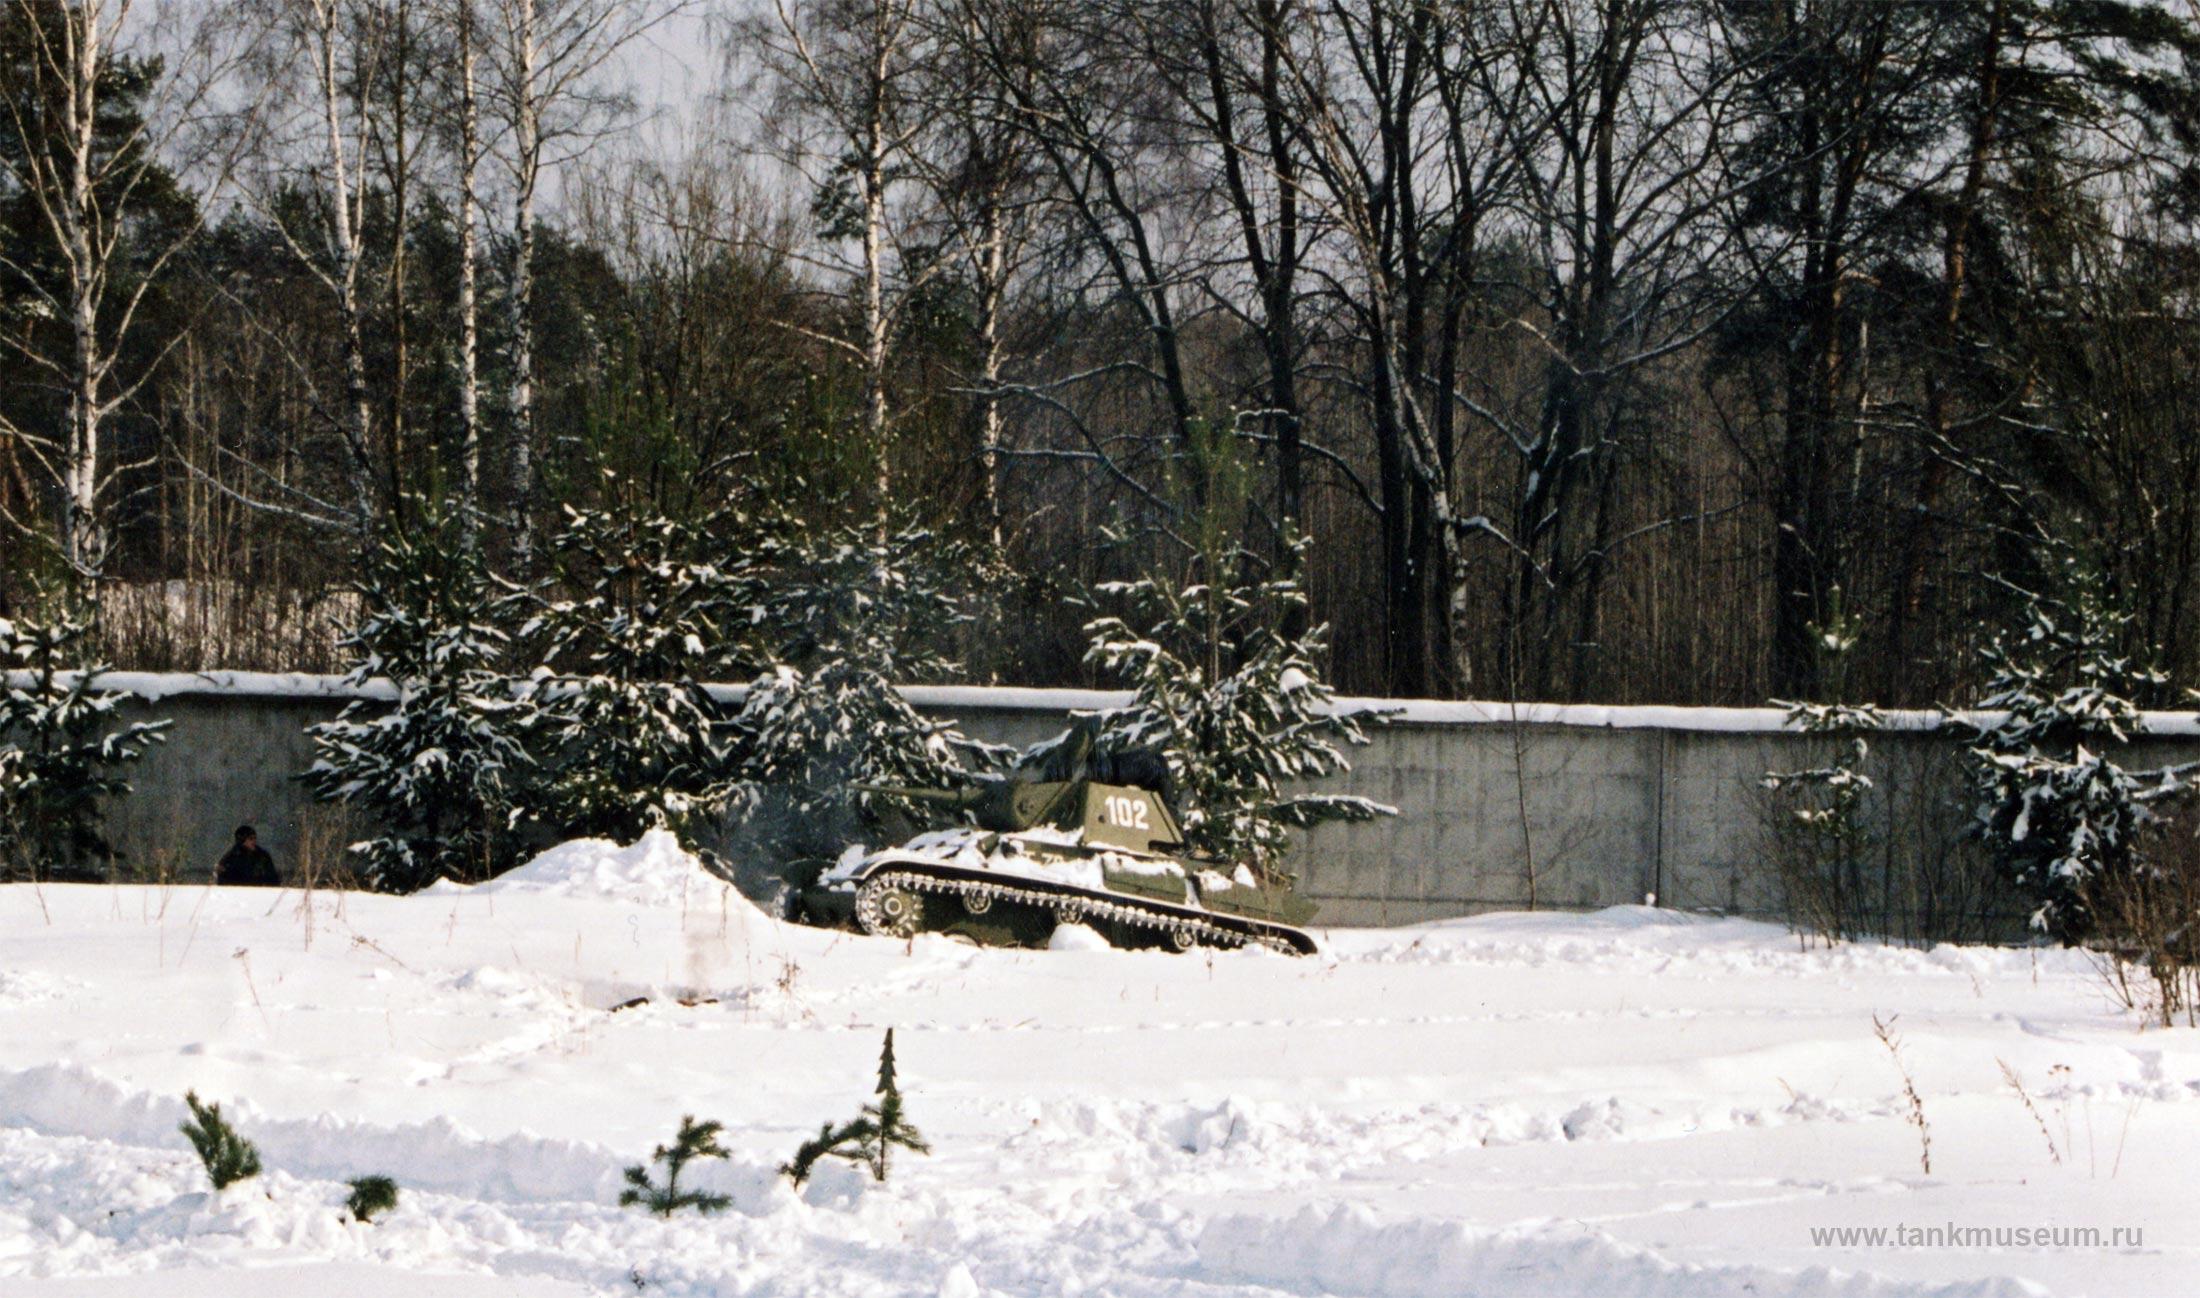 Танк Т-70 на празднике 23 февраля, Дне защитника Отечества